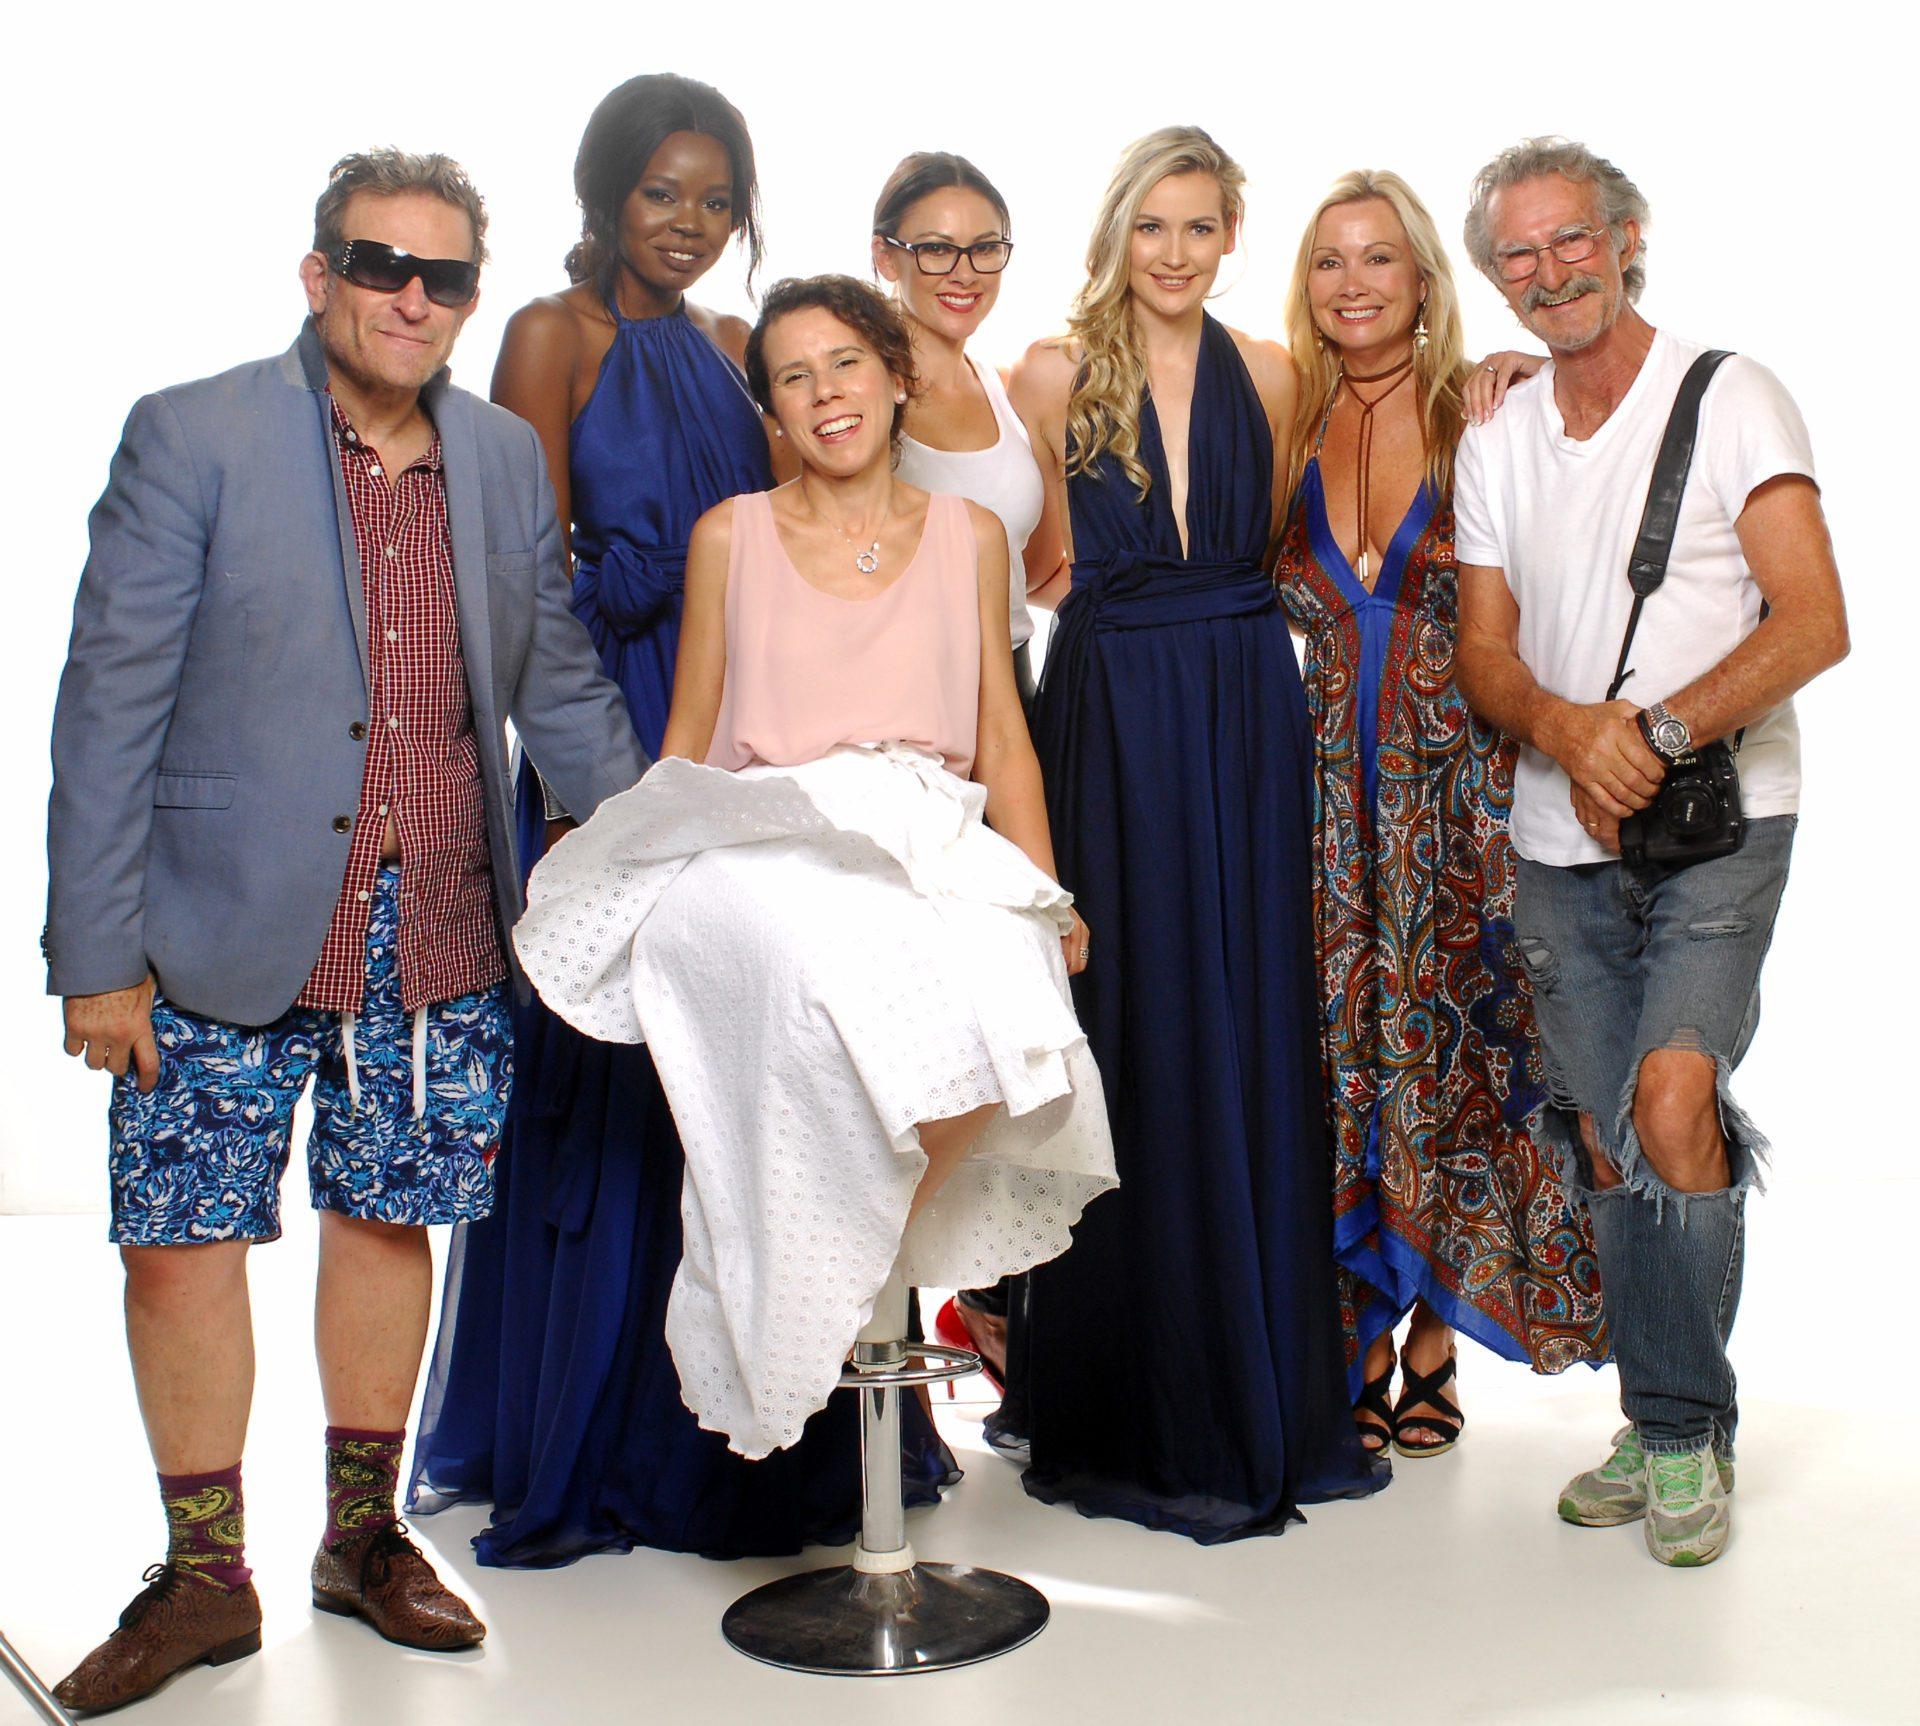 Fashion crew: Henry Weinreich Roth, Nyadier Apech, Alarna Bell, Jessica Parish, Celeste Billinge, Maurice Rinaldi & front Lucy Laurita.